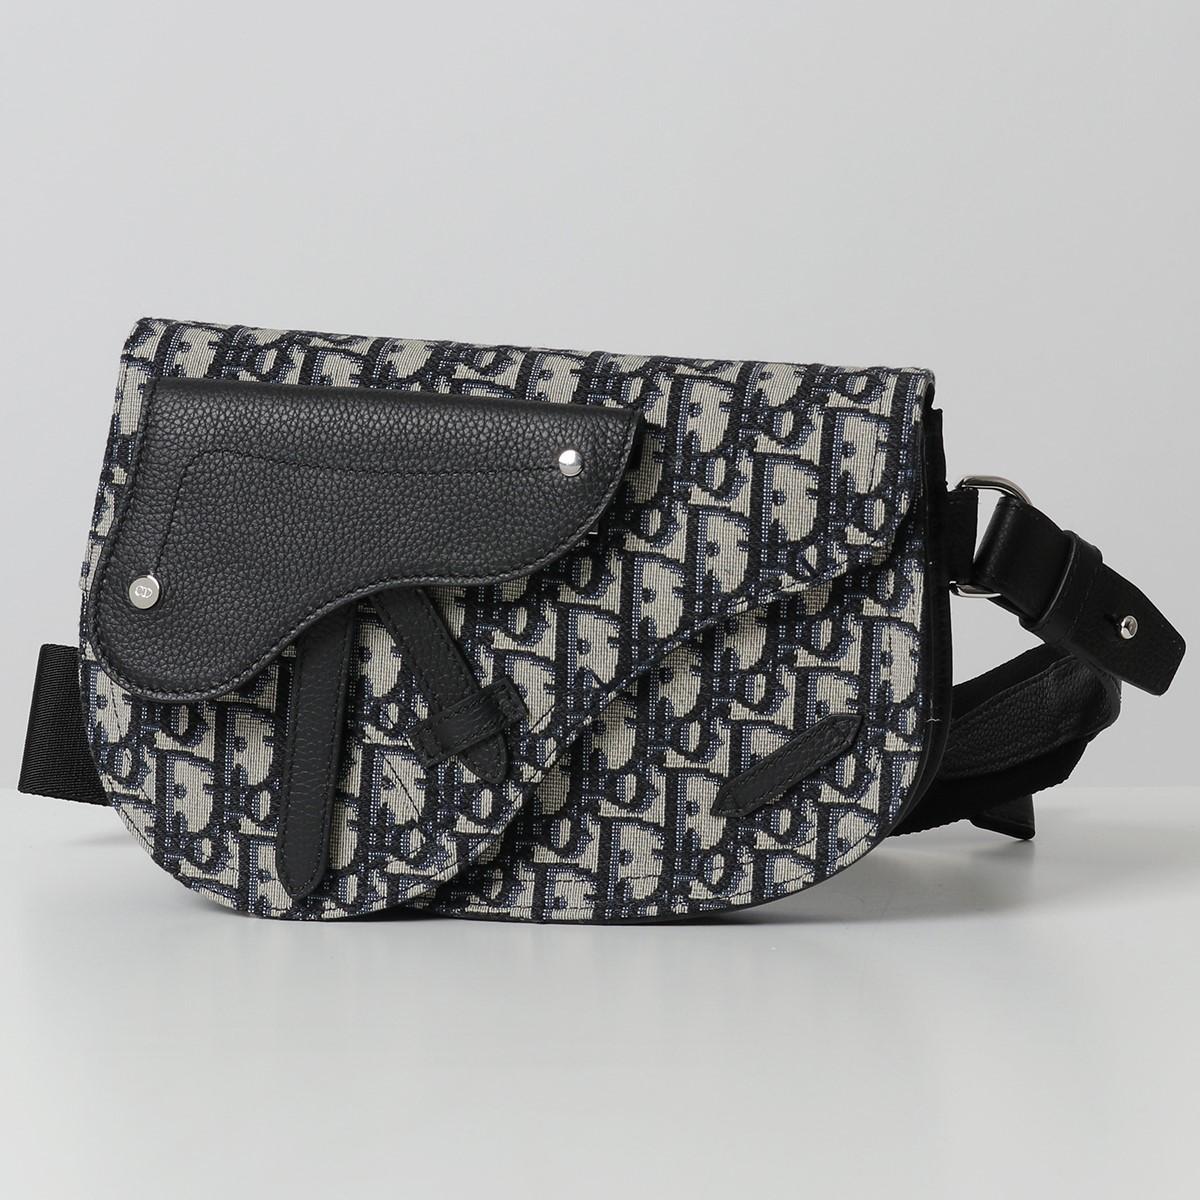 DIOR HOMME ディオールオム 1ADPO095YKY SADDLE POUCH オブリーク サドルバッグ ベルトバッグ ボディバッグ 28E/MULTICOLORE 鞄 メンズ